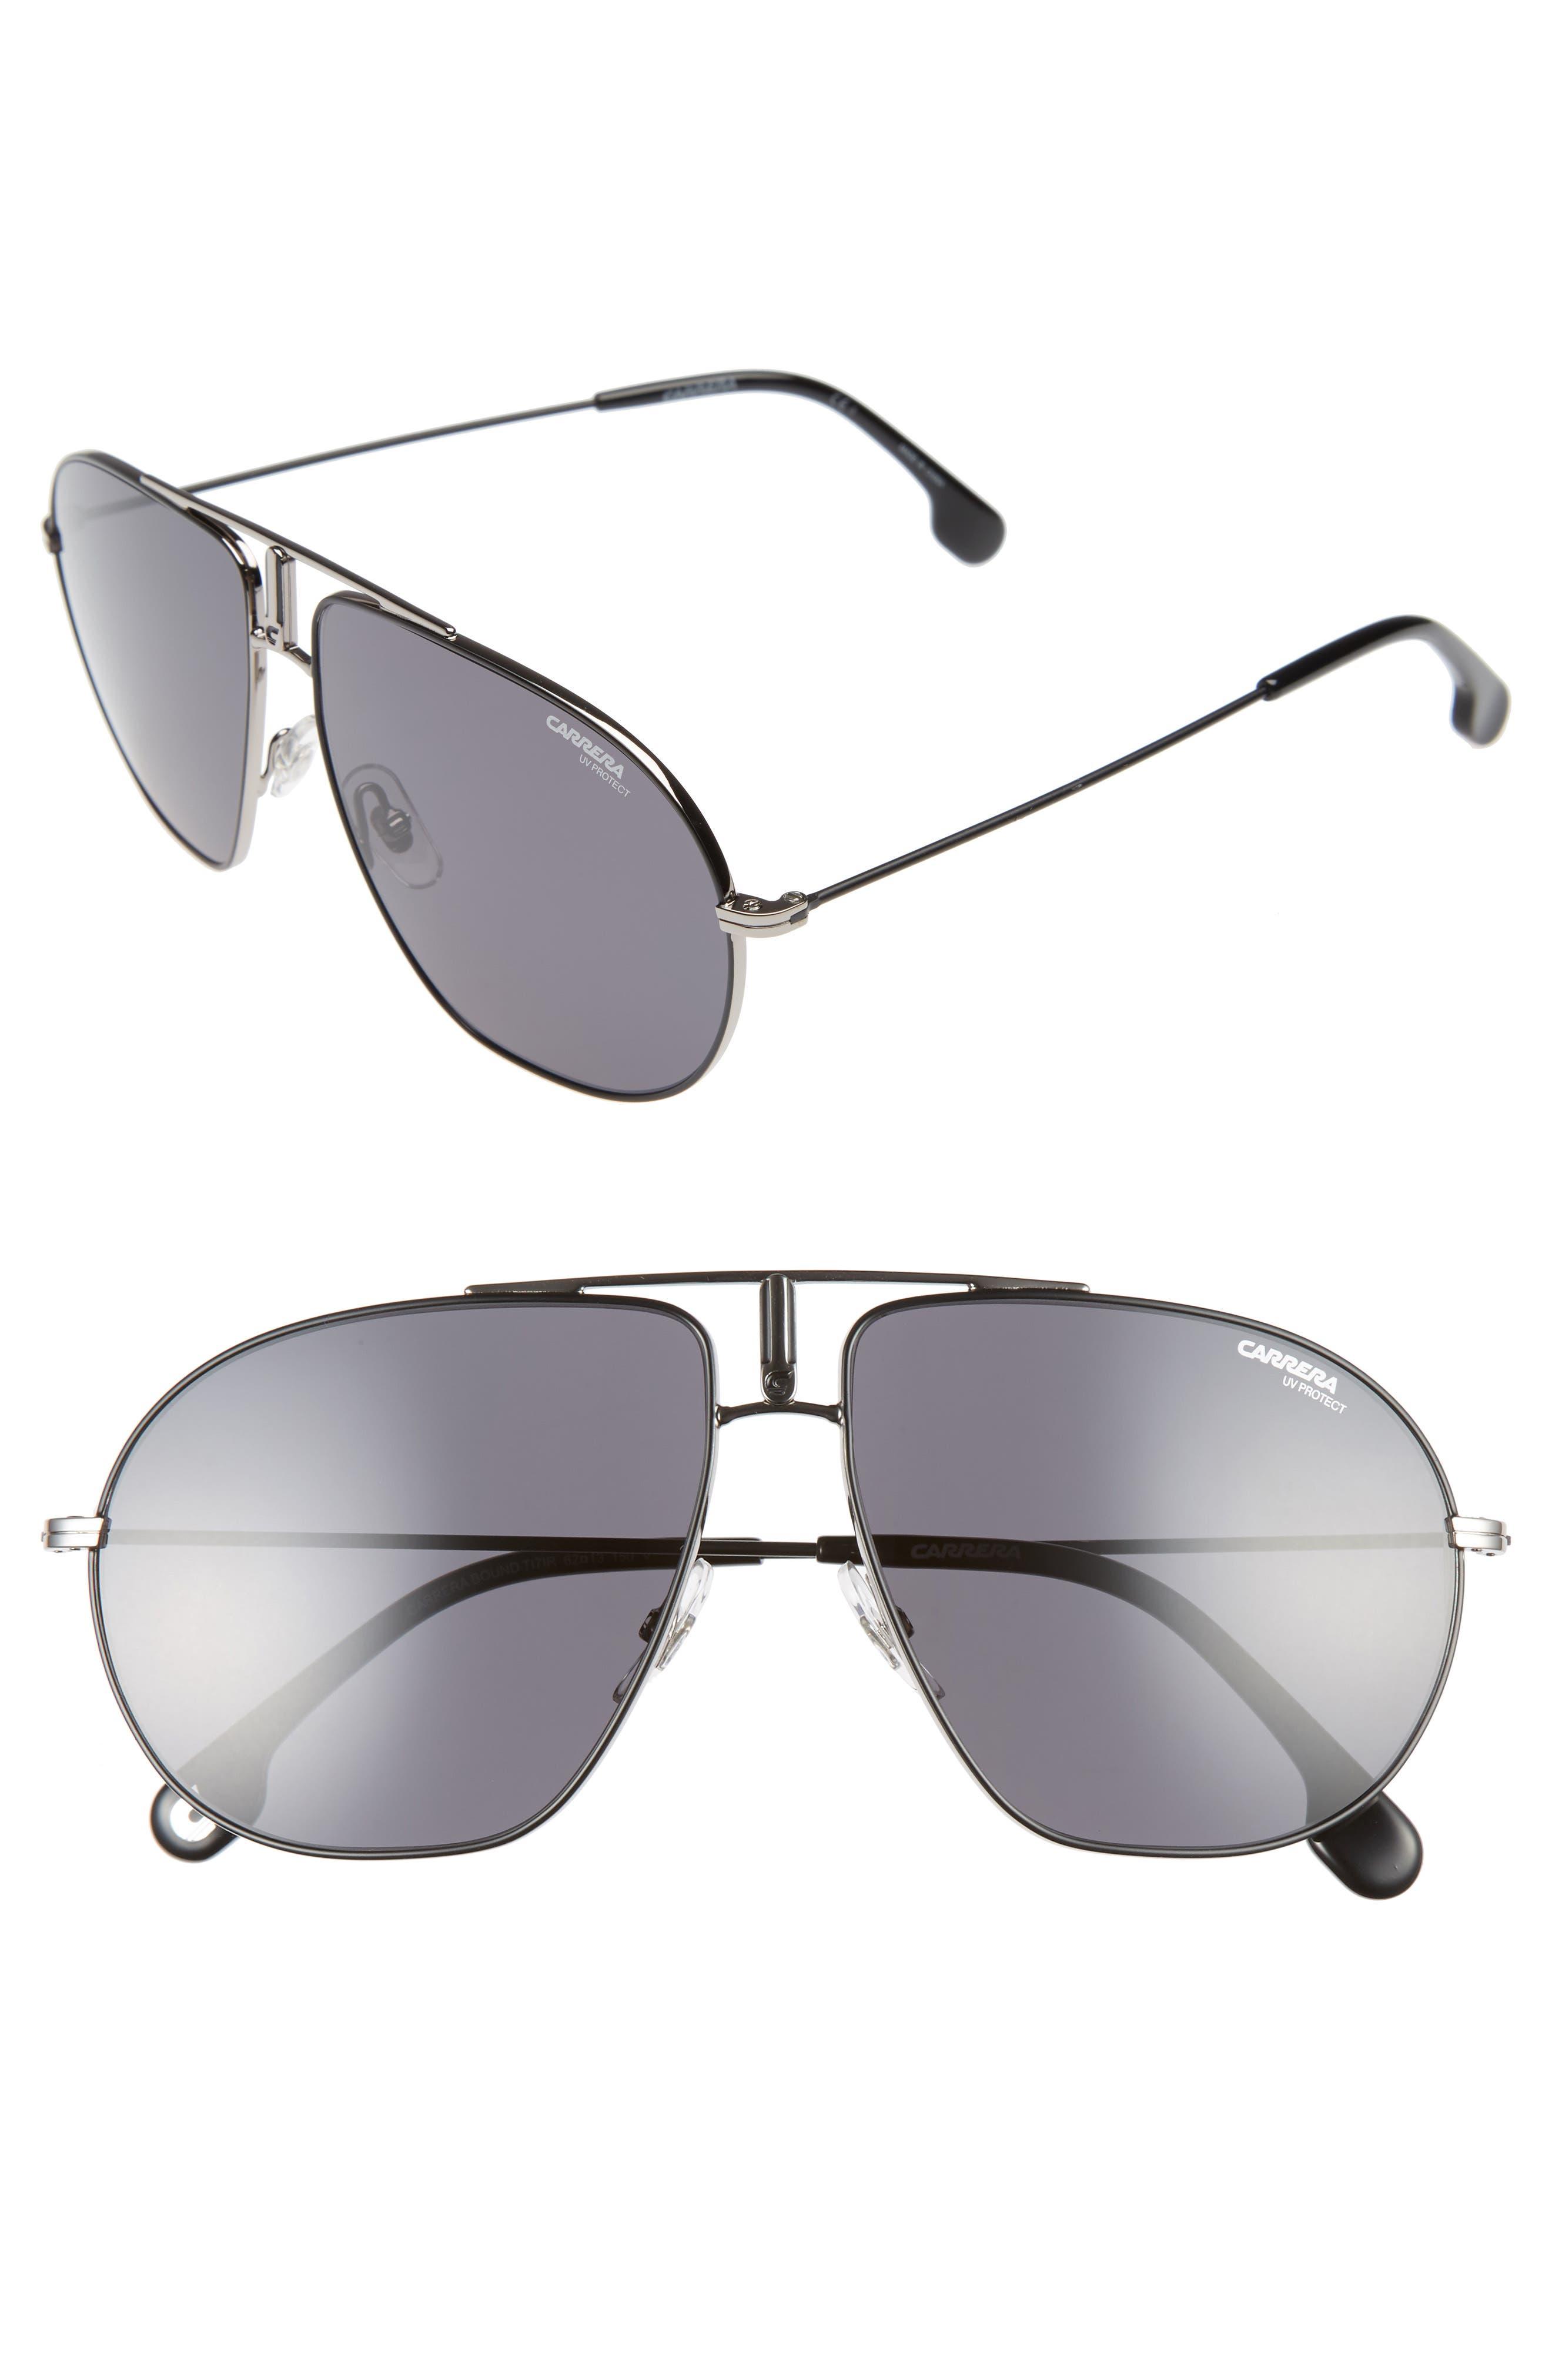 Carrera Eyewear Bounds 60Mm Gradient Aviator Sunglasses - Ruthenium Grey/ Matte Black